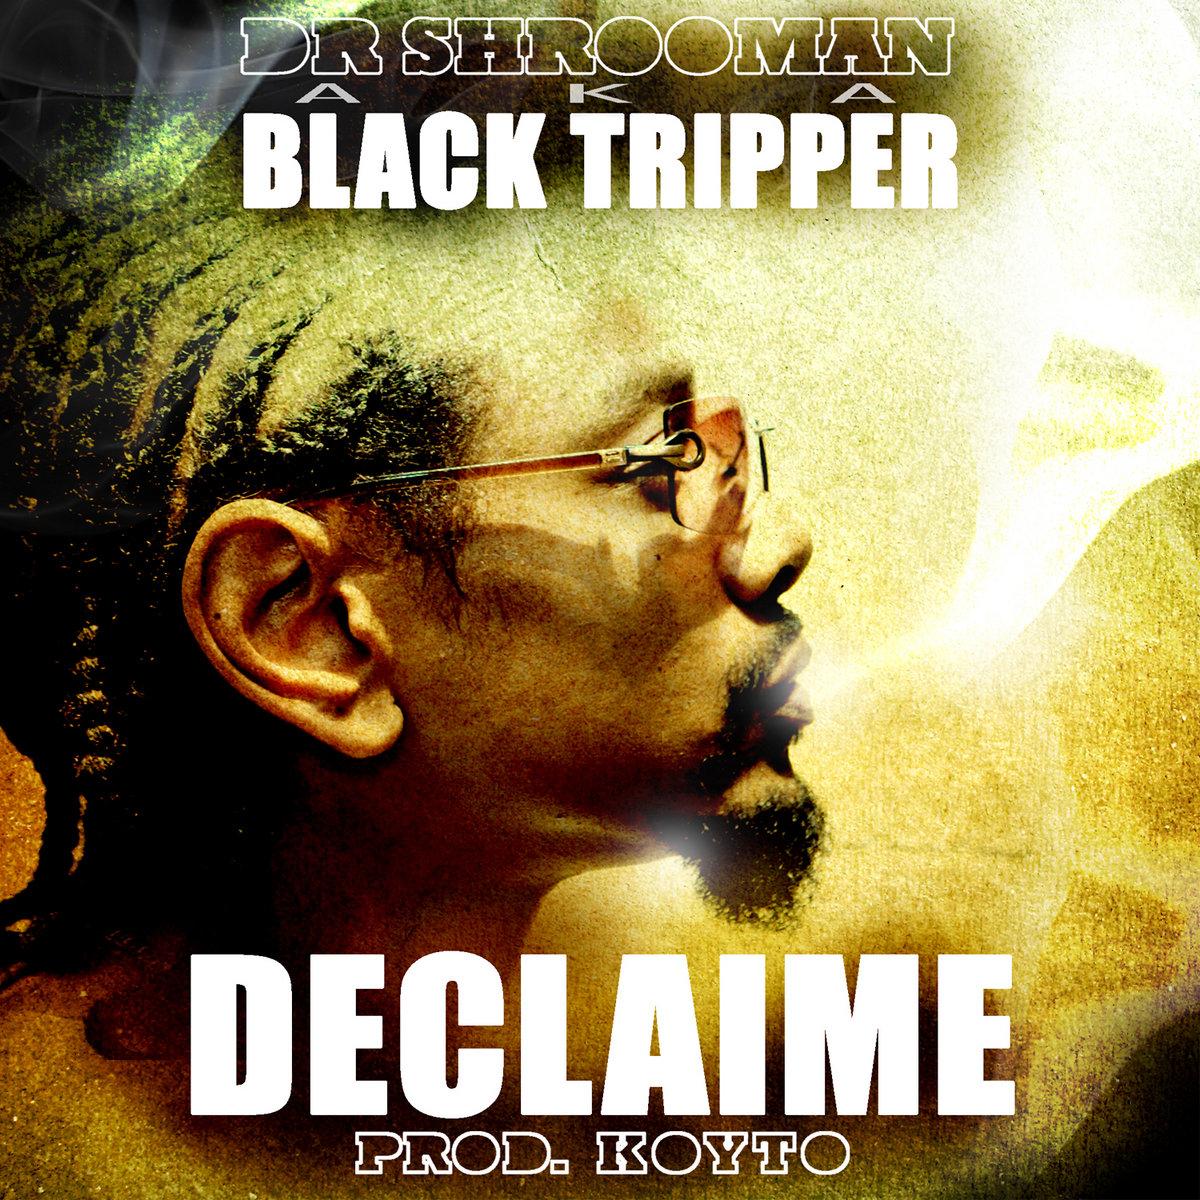 Resultado de imagen para Declaime - Dr. Shrooman Aka Black Tripper